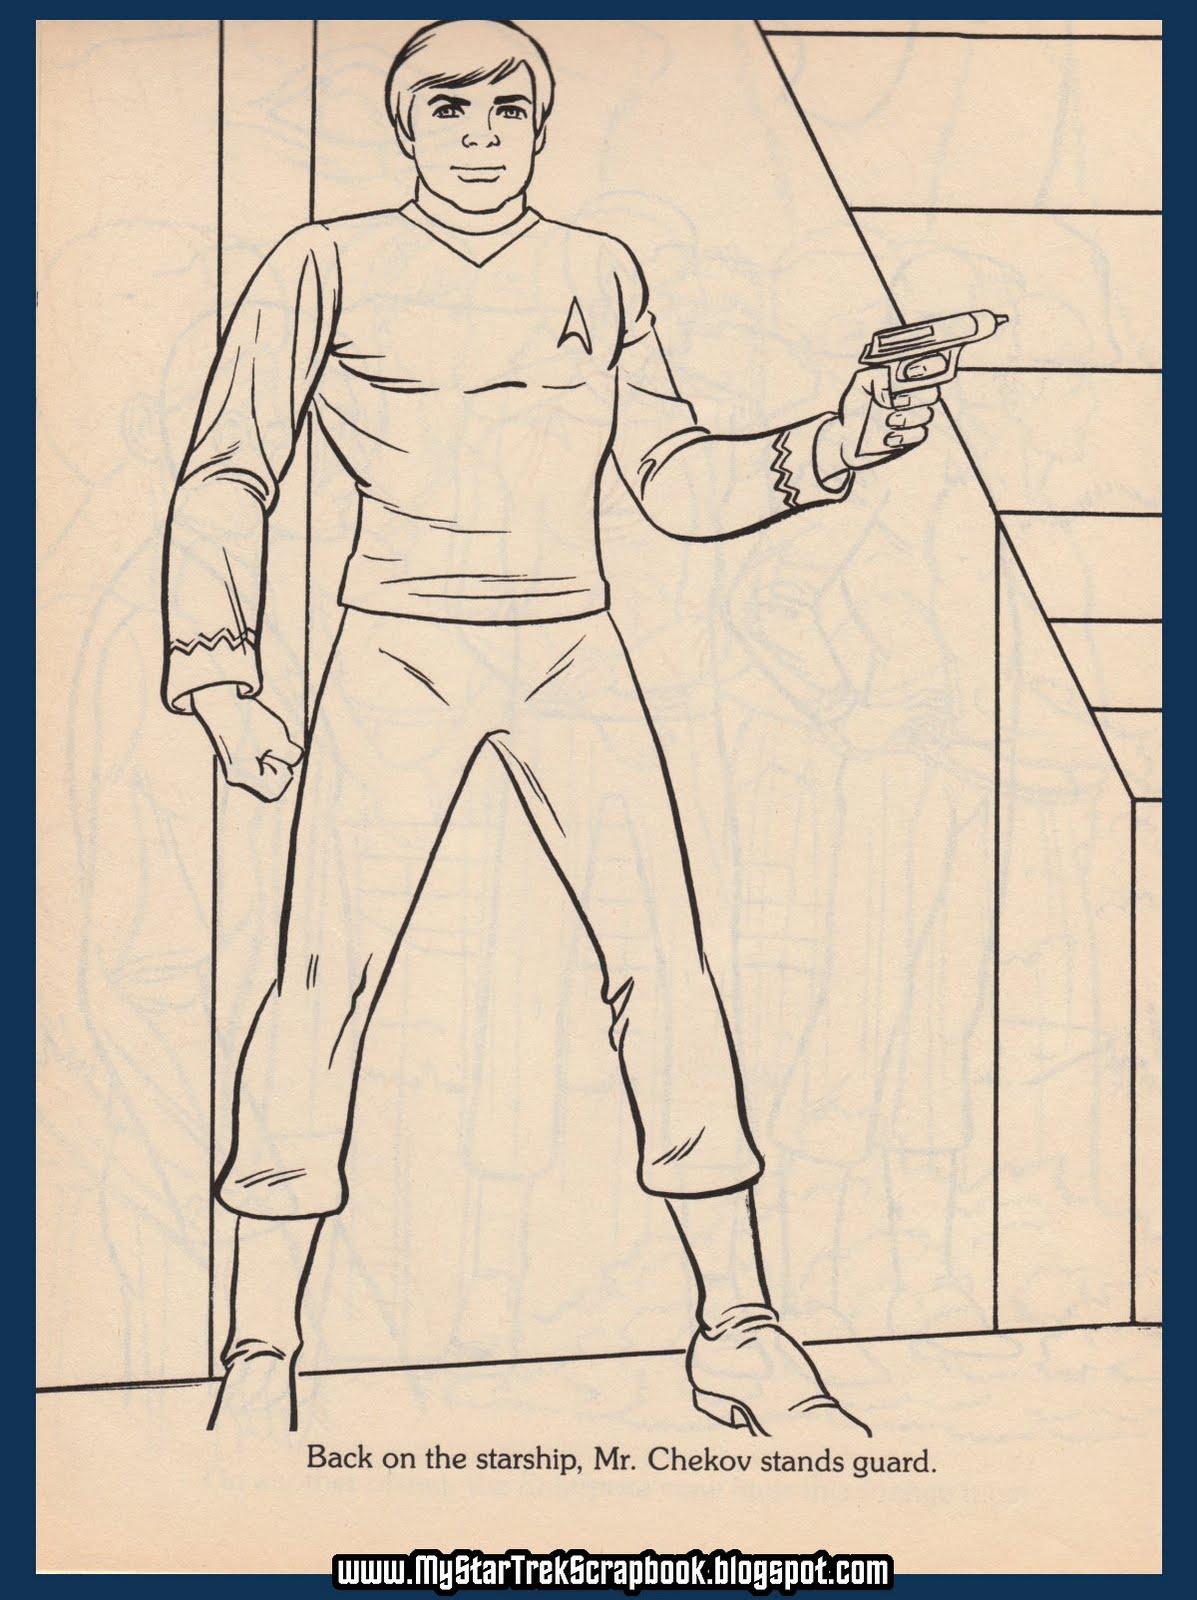 Wonderful Sports Car Coloring Pages Tiny Position Coloring Book Round Bun B Coloring Book Doodle Coloring Book Young Book Of Colors WhiteColor Swatch Book My Star Trek Scrapbook: Star Trek Aliens Coloring Book